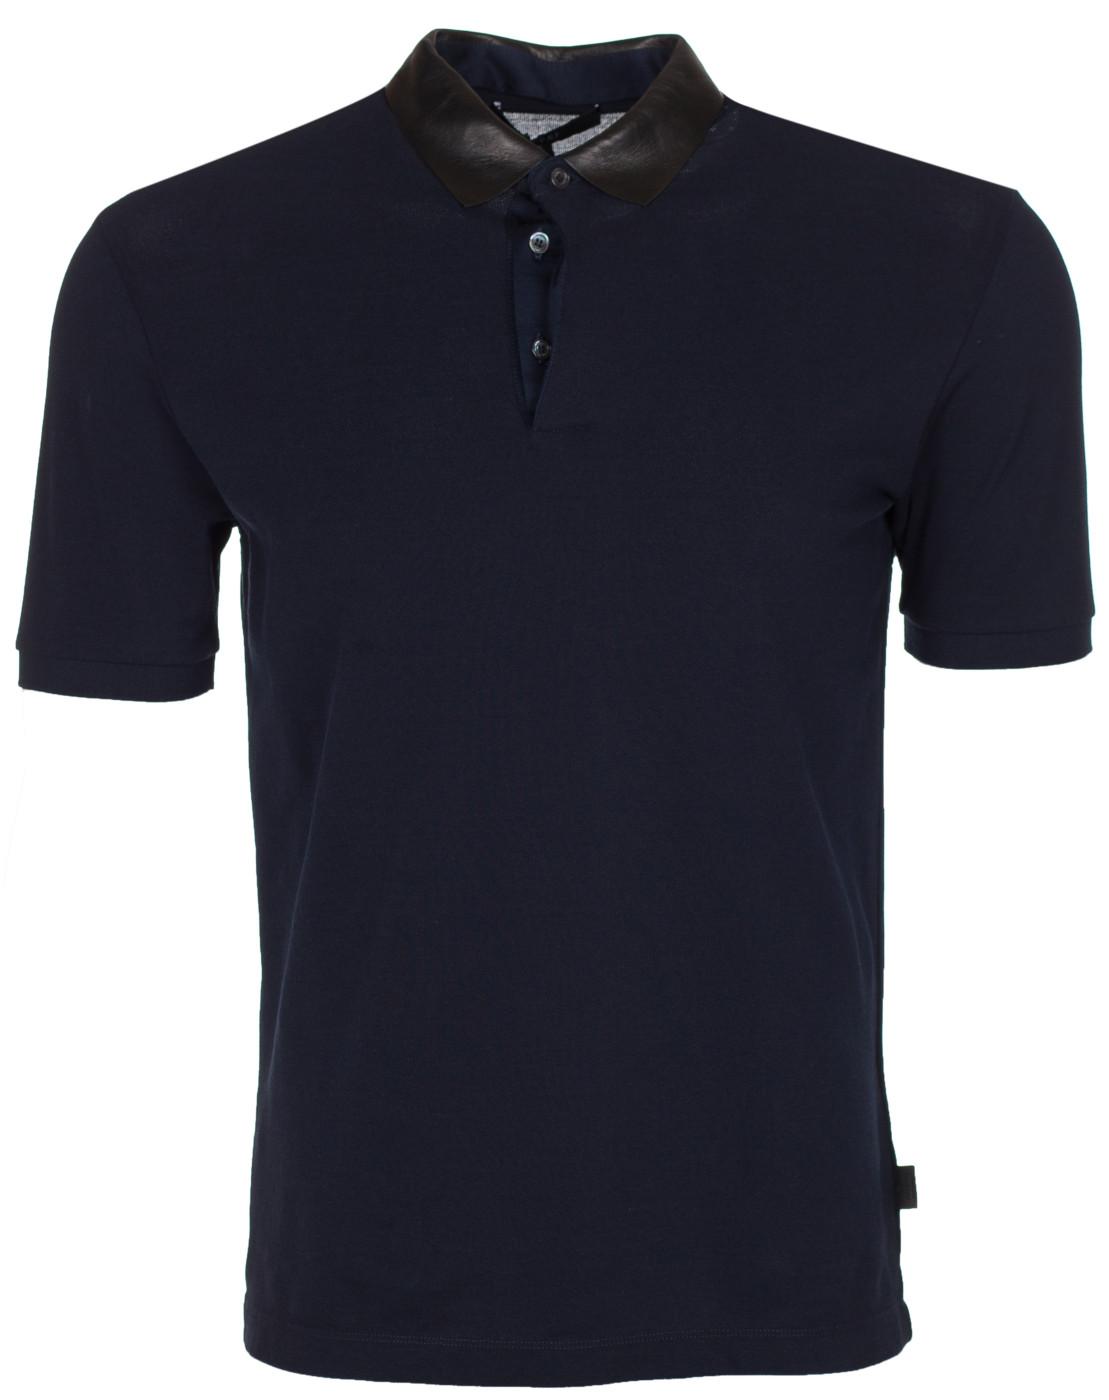 a7ead8d5dd92 Gucci Men s Dark Blue Leather Collar Polo Shirt